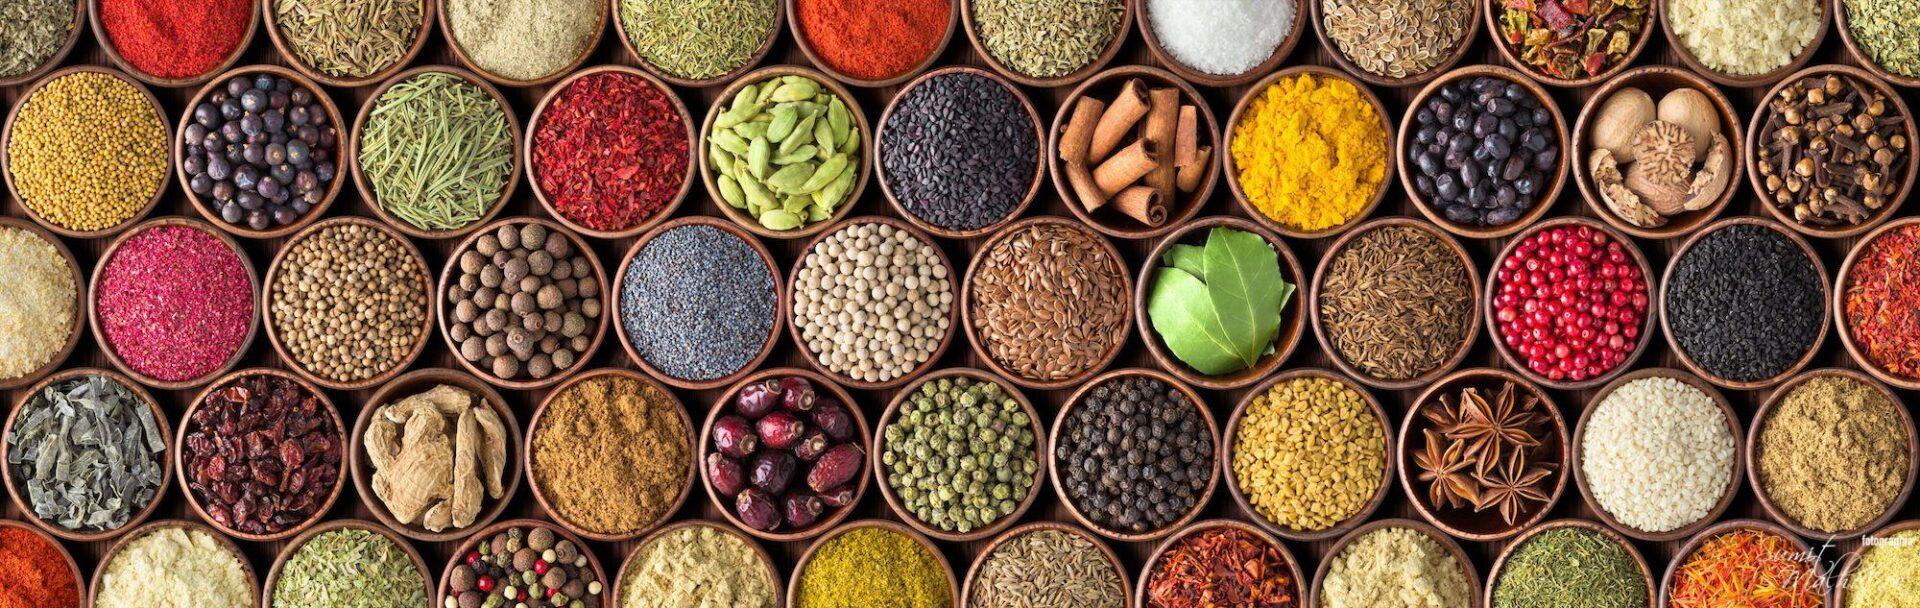 Coronavirus Prevention & CoVID-19 Mitigants   Immunity Booster Spices   Spices that Boost Immunity